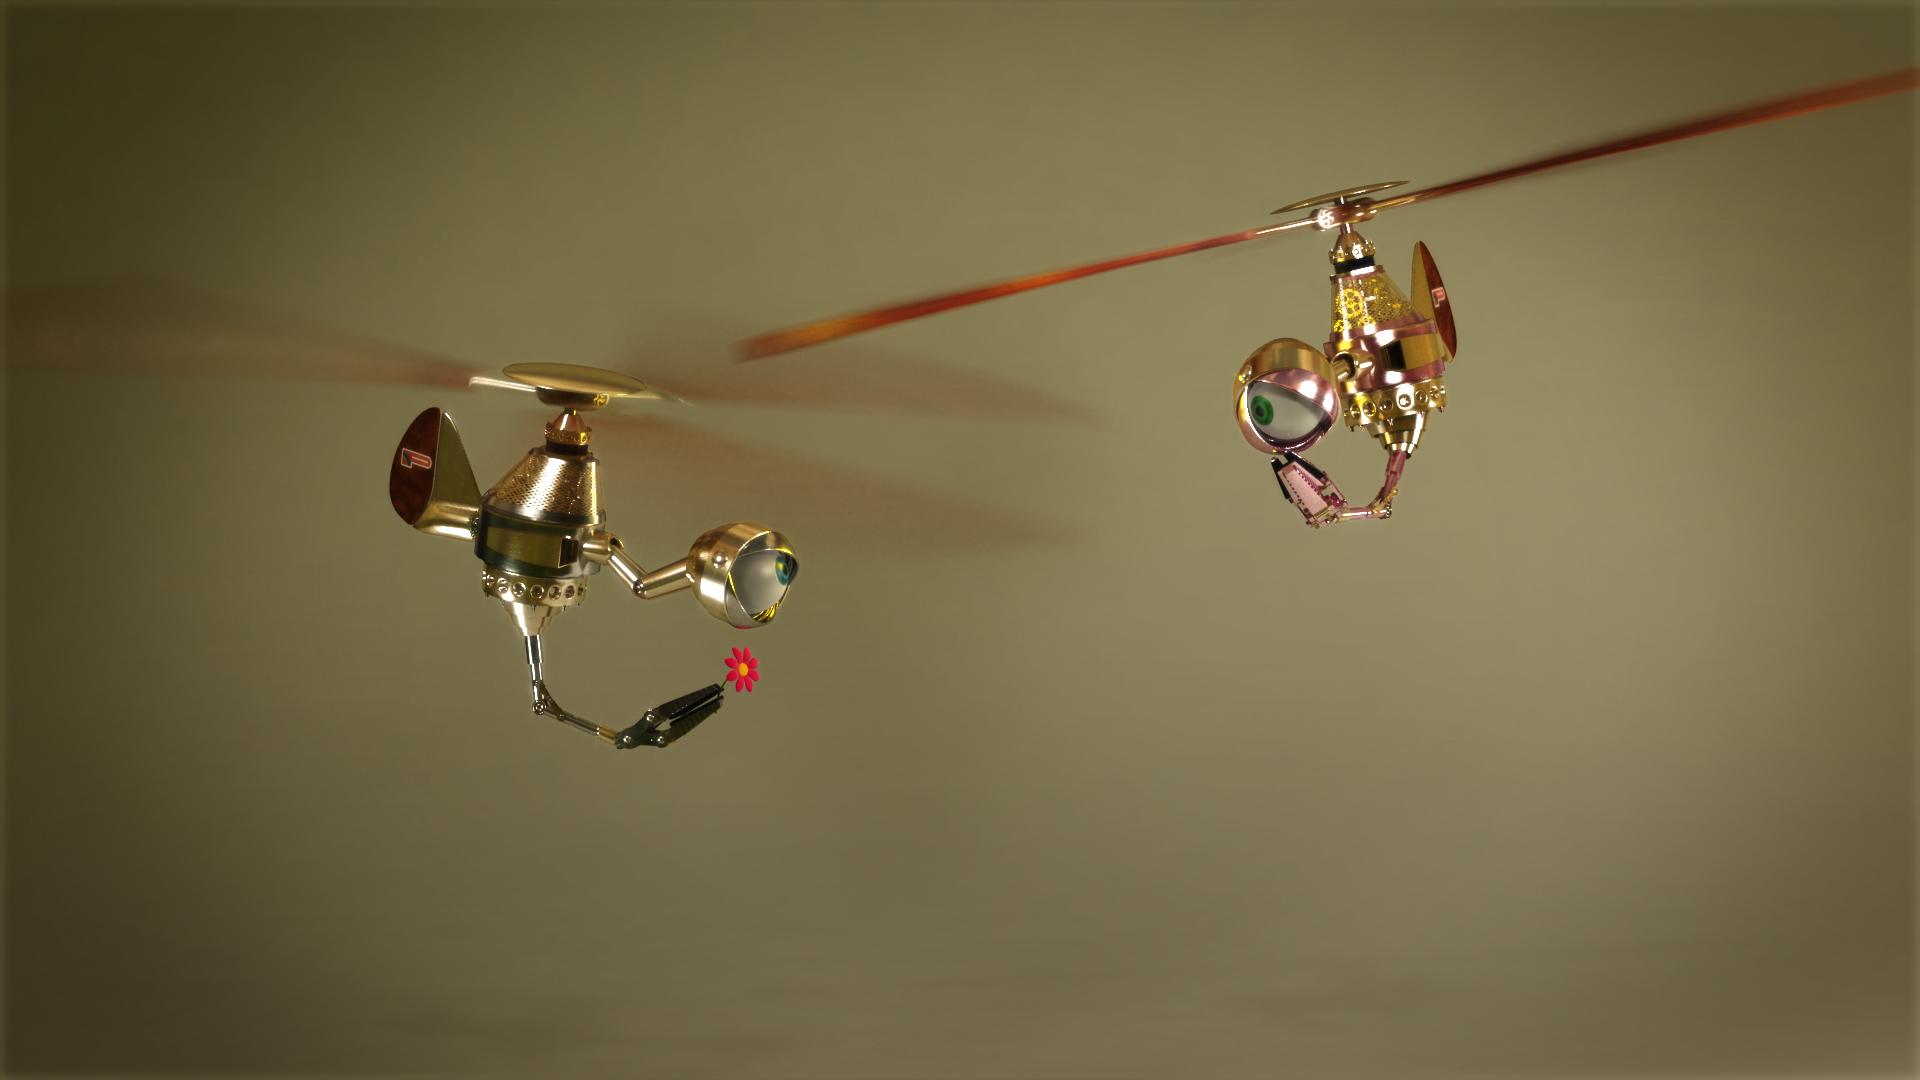 Chopper Couple